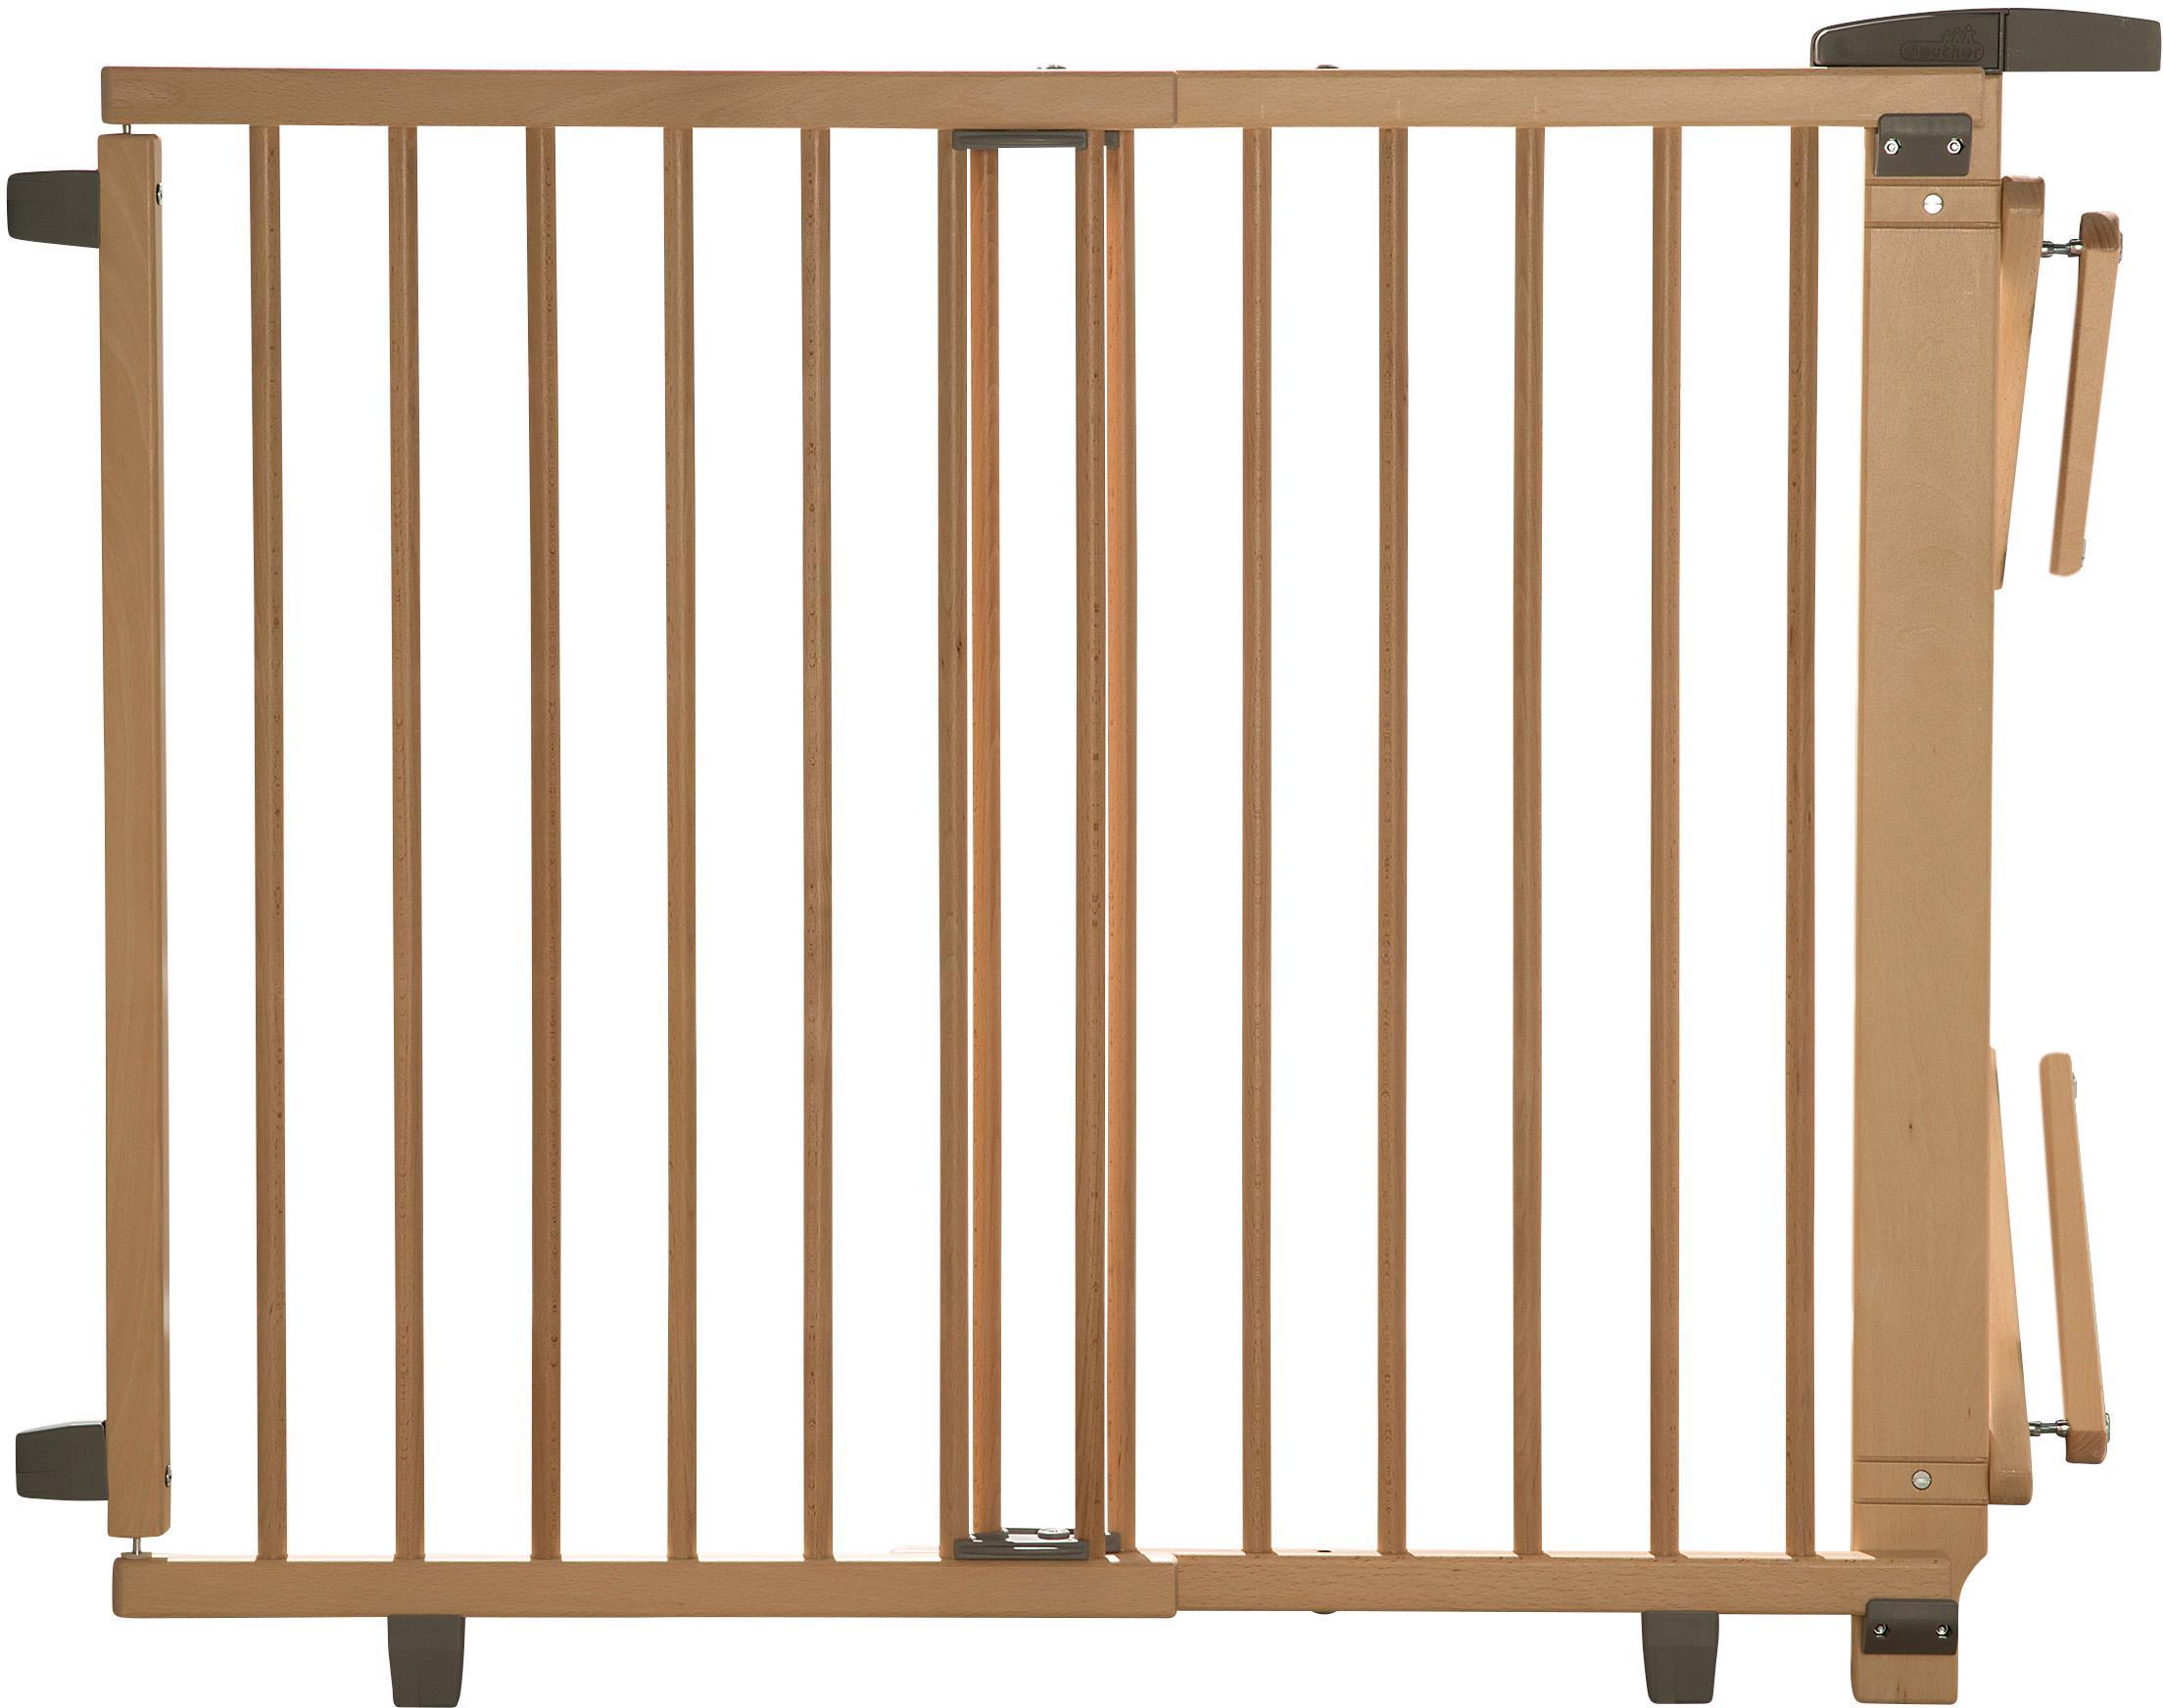 Geuther Treppenschutzgitter Plus natur 95-135 cm Kindermode/Ausstattung/Babygitter/Treppenschutzgitter